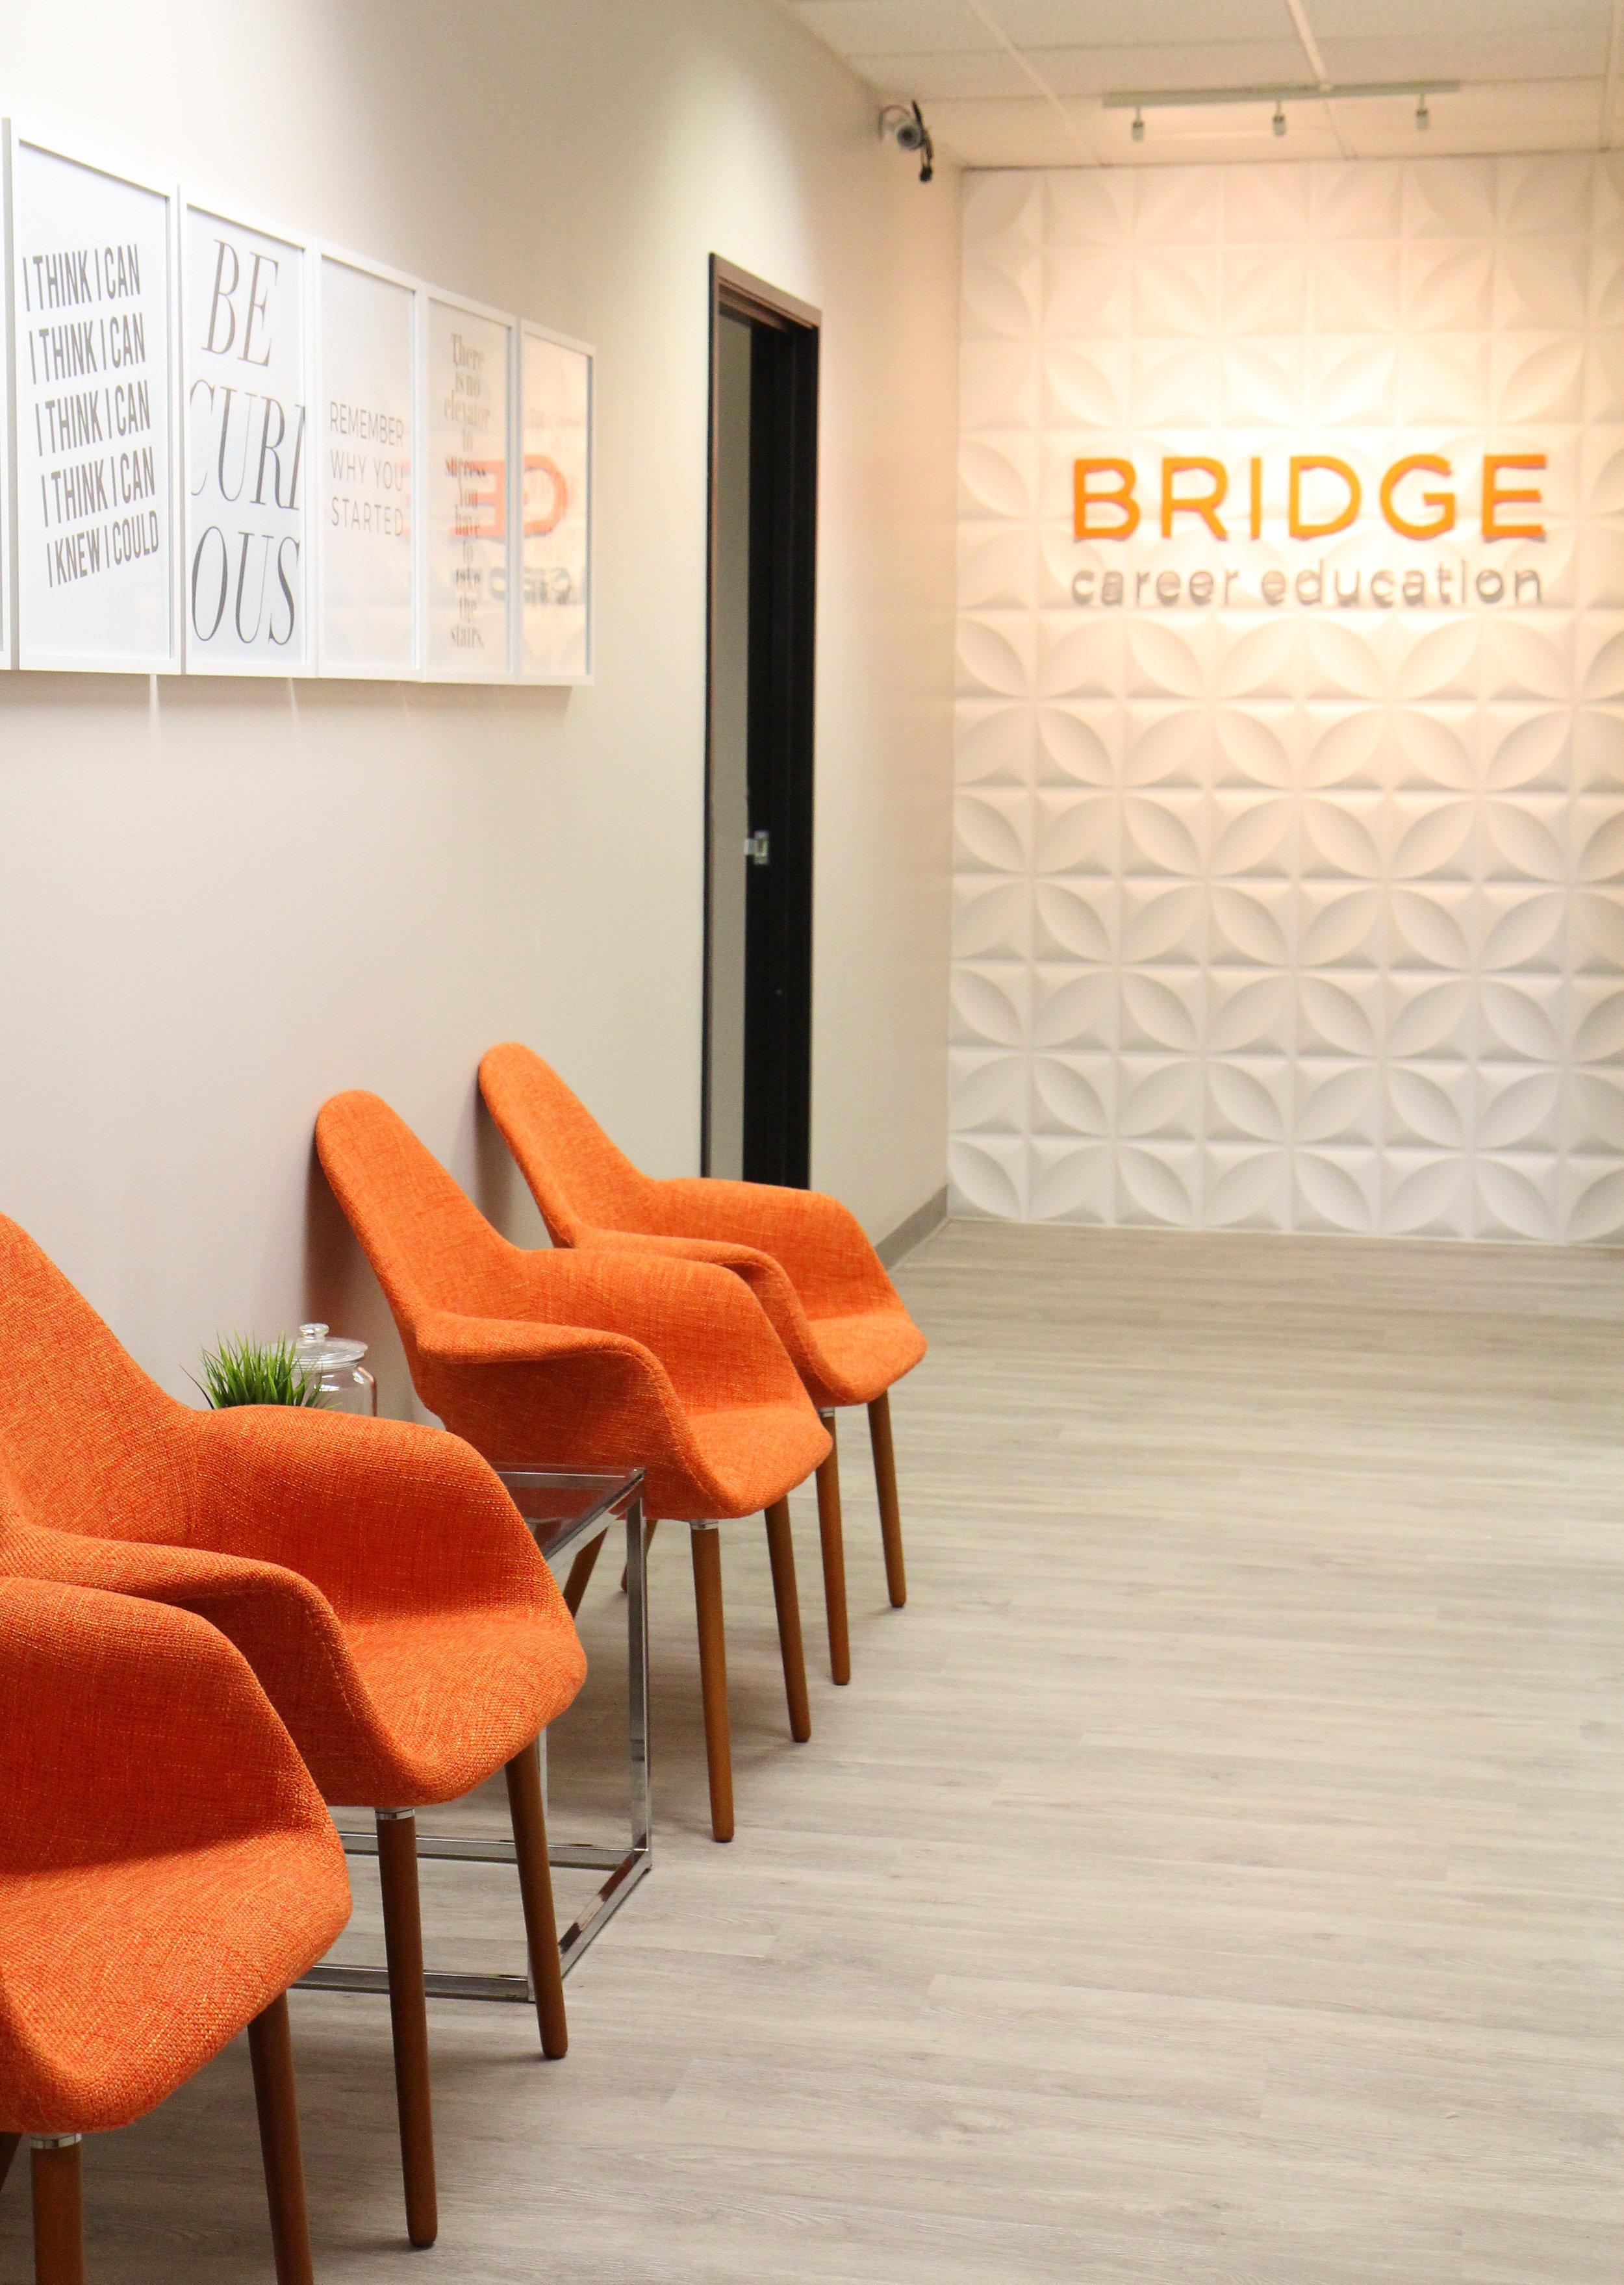 bridge-career-education-san-diego-college-reception-medical-assistant-biller-programs.jpg